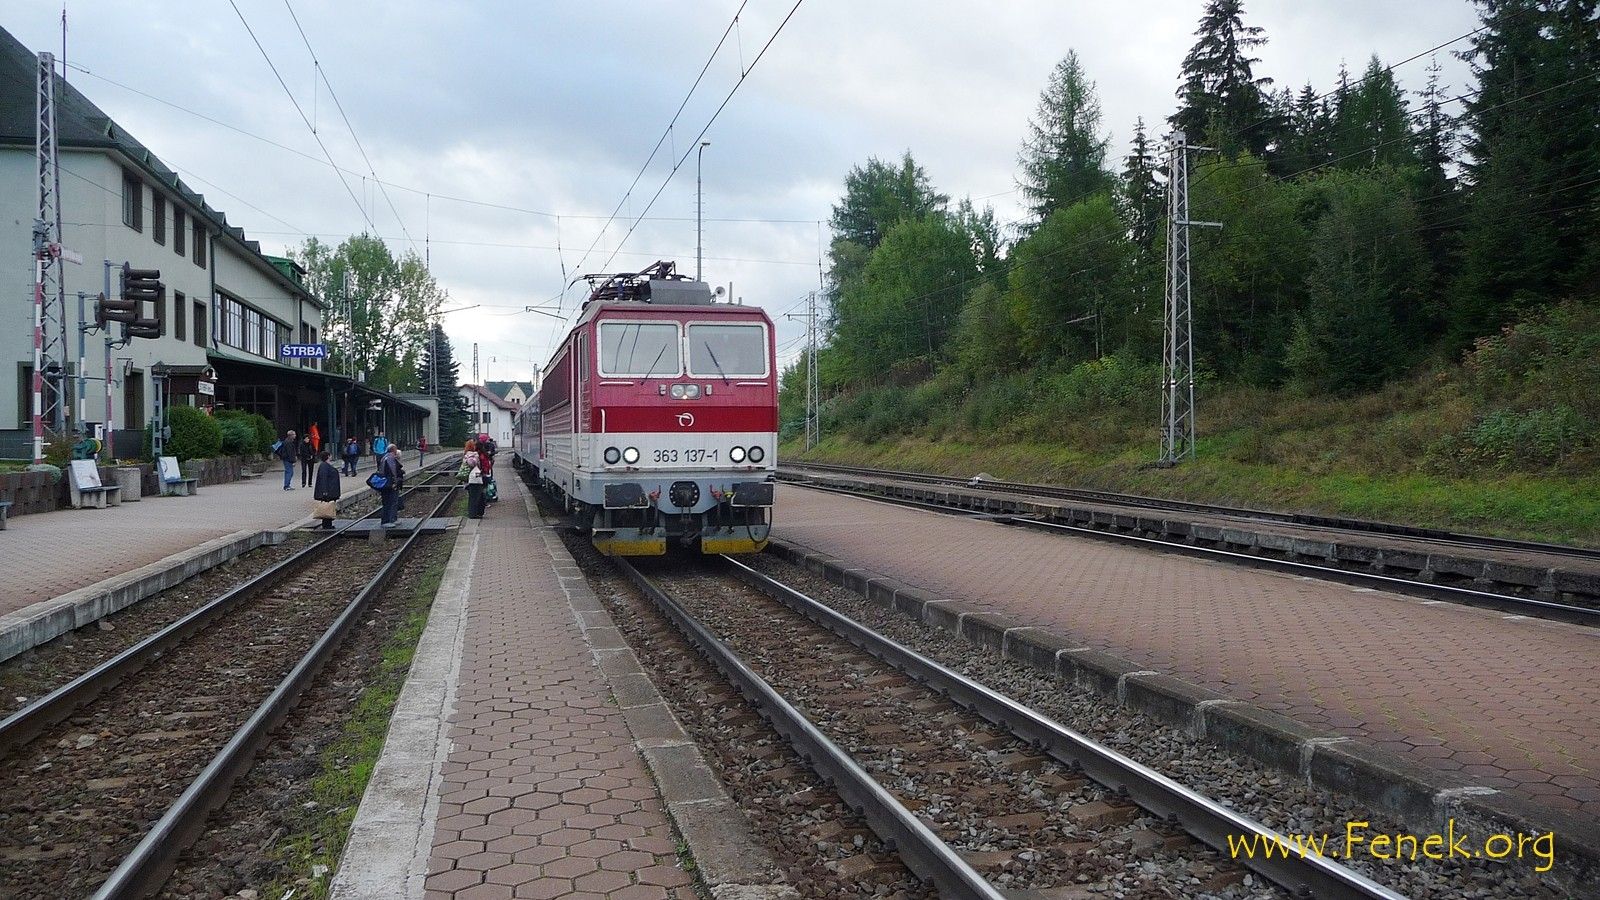 Bahnhof Strba